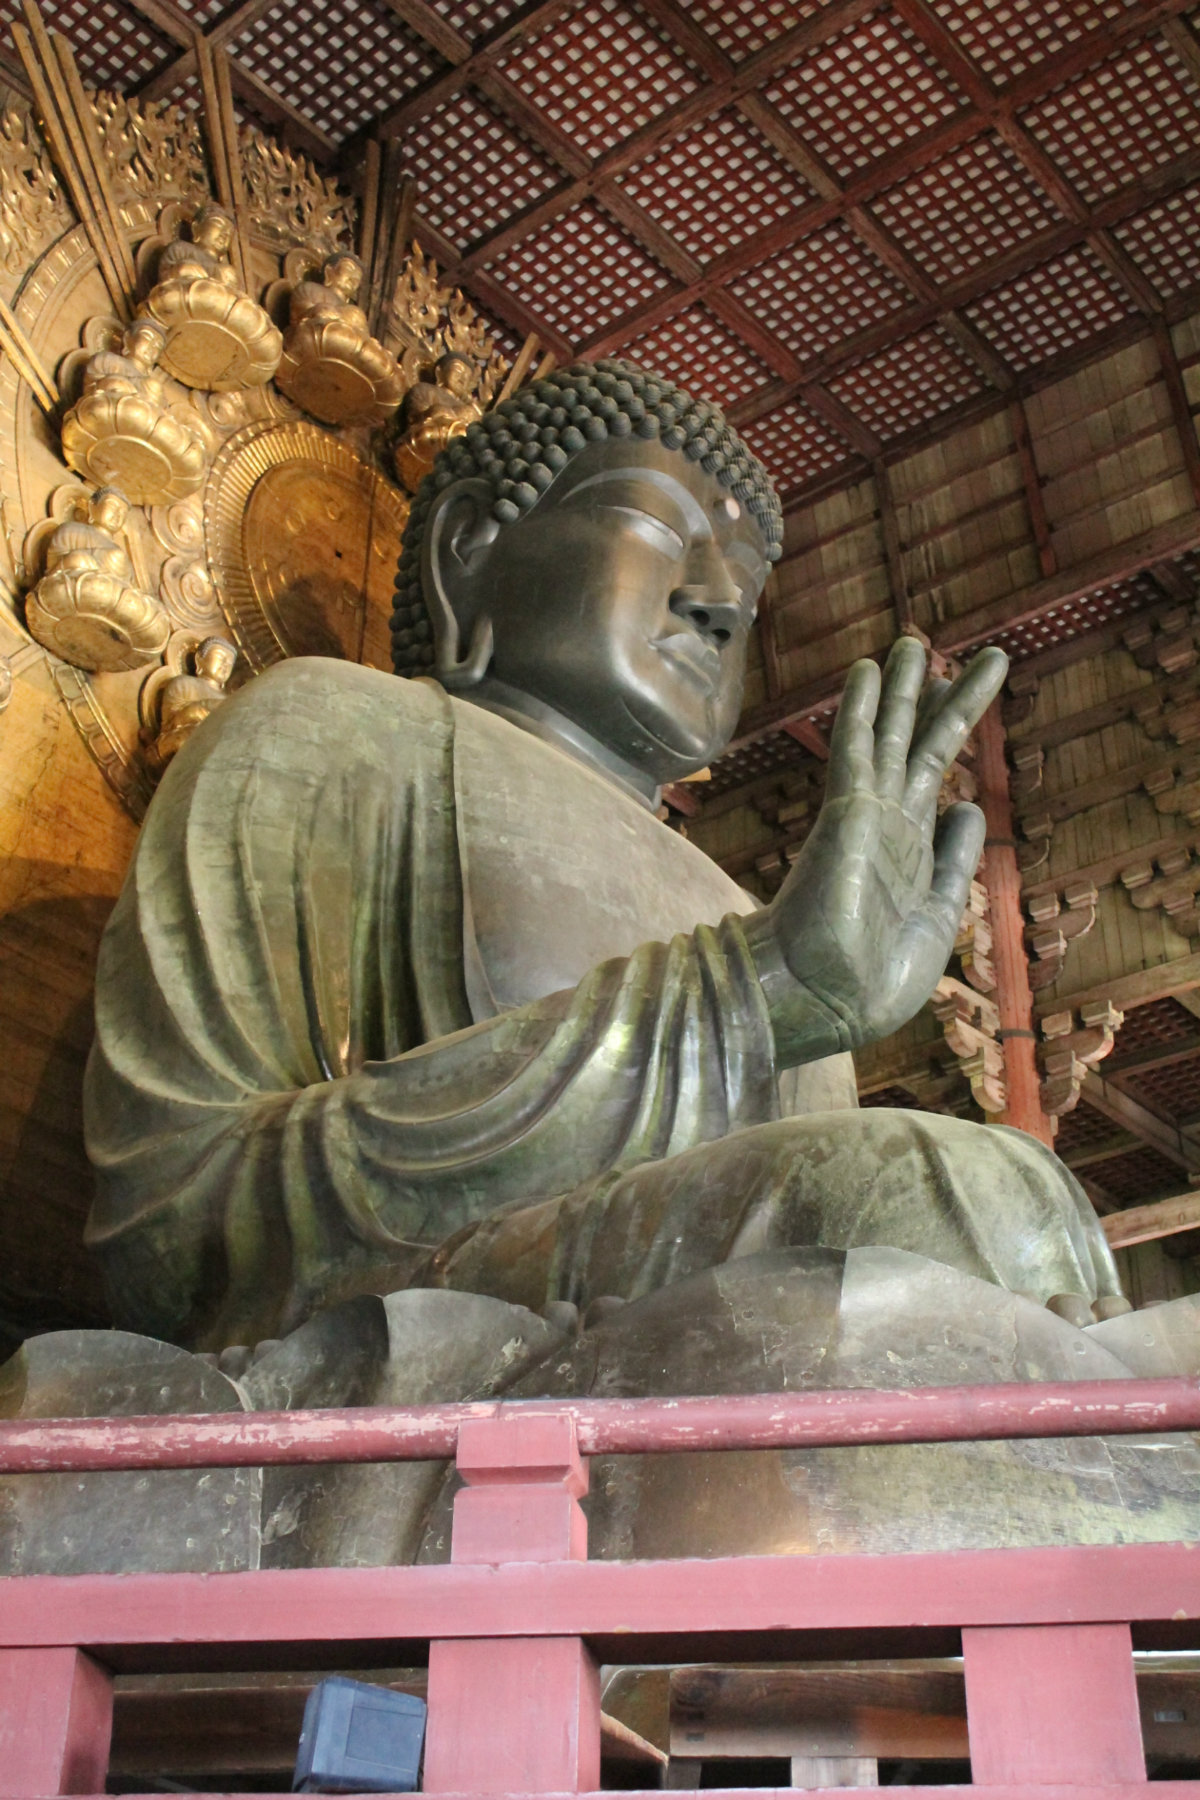 The bronze Buddha. I'm watching you!